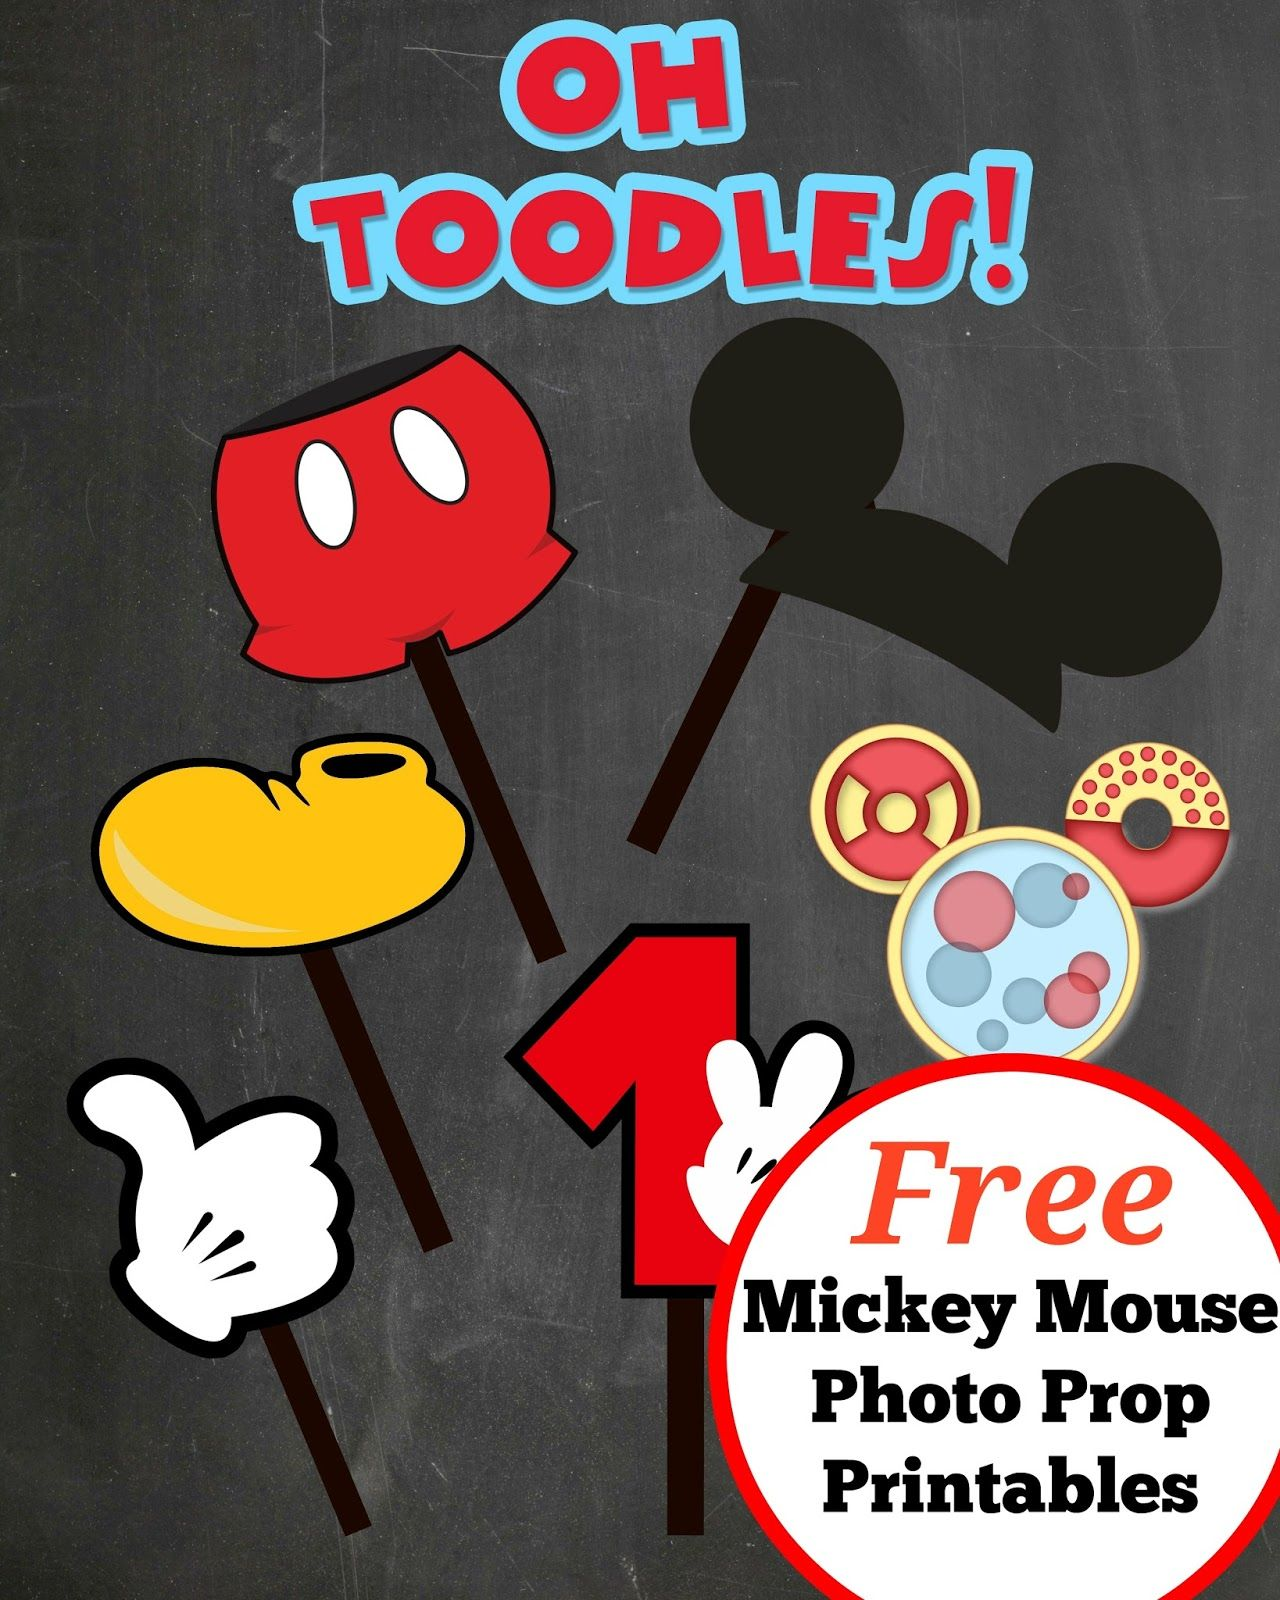 25 Free Disney Printables